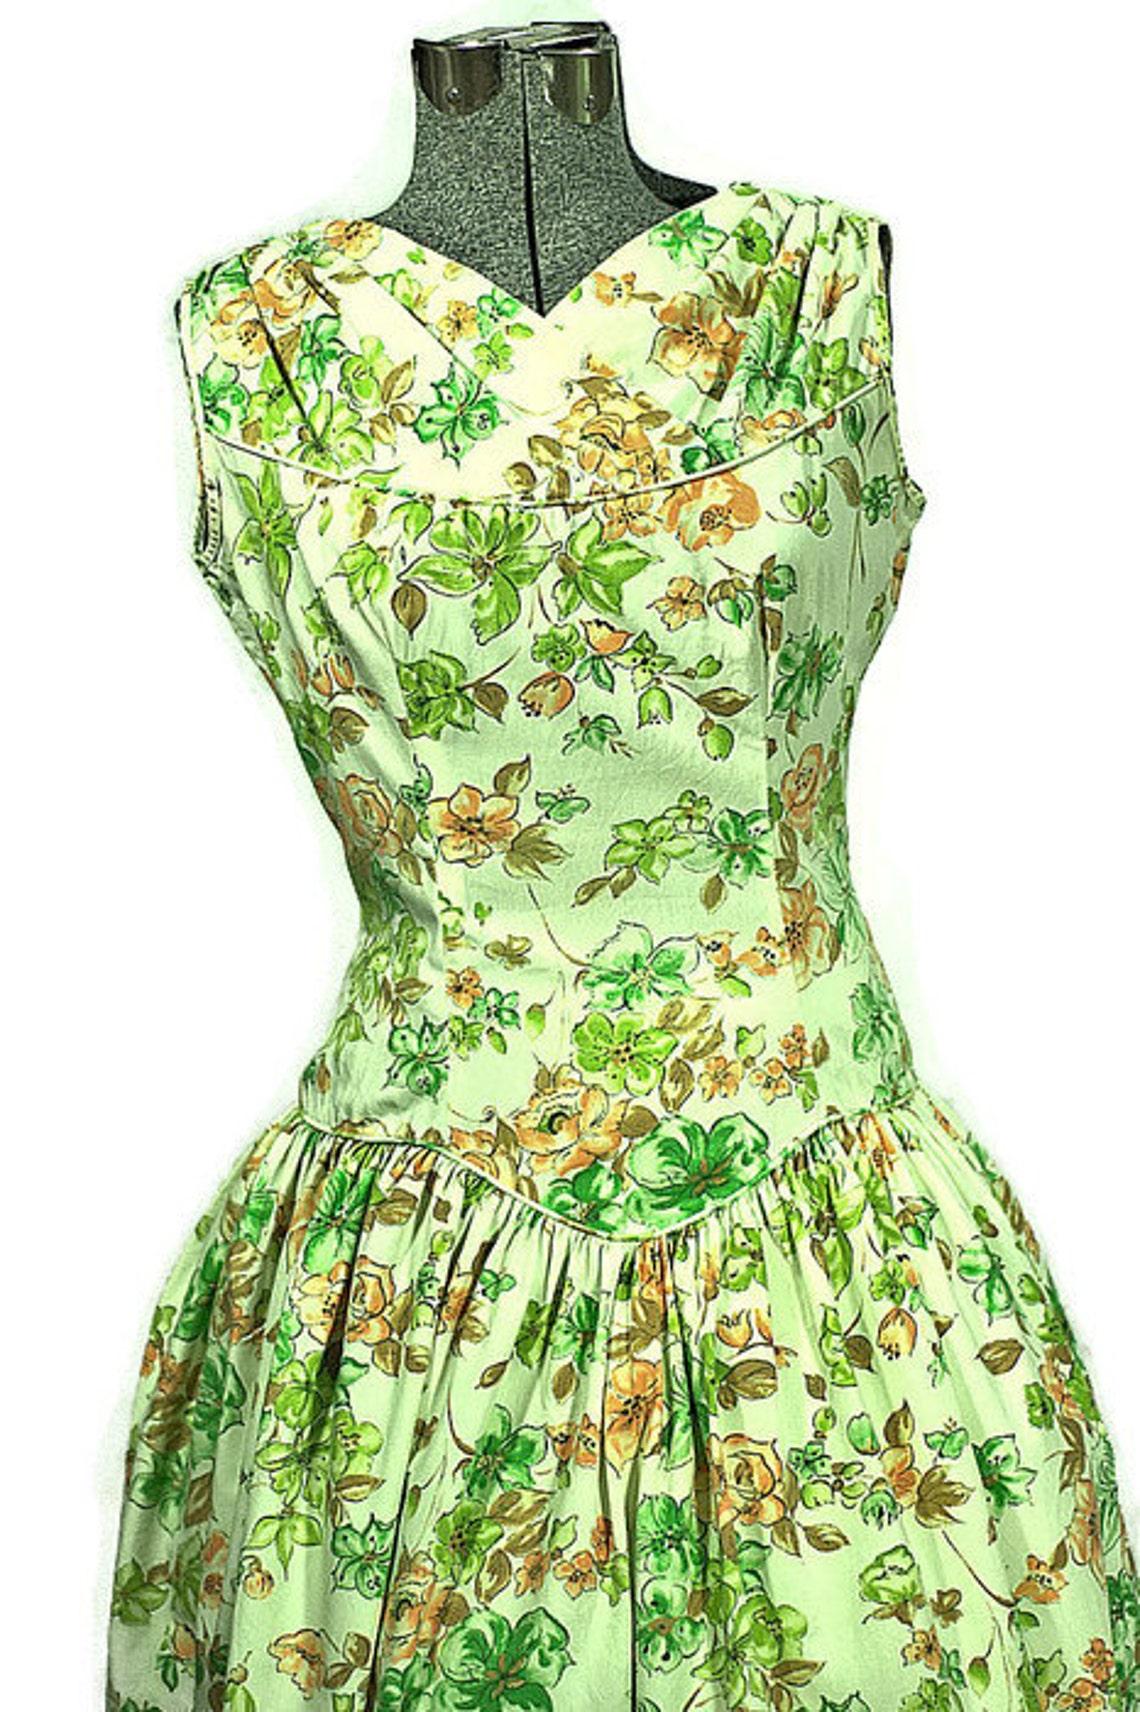 1950 Cotton Day Dress. Vintage Spring Drop Waist Cotton Dress.